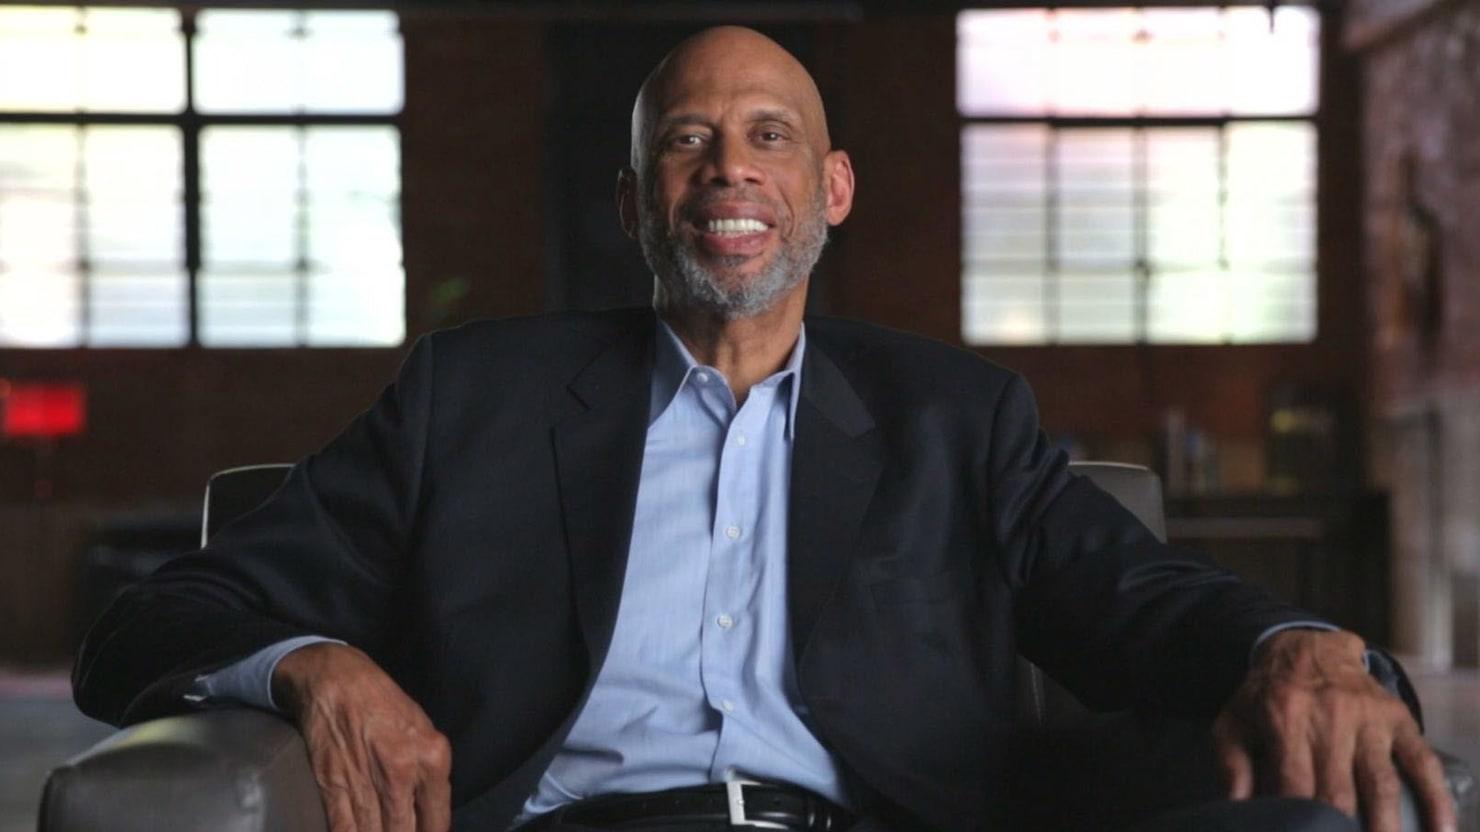 Kareem Abdul-Jabbar Finds His Voice: The NBA Legend on White Privilege, Politics, and Islam